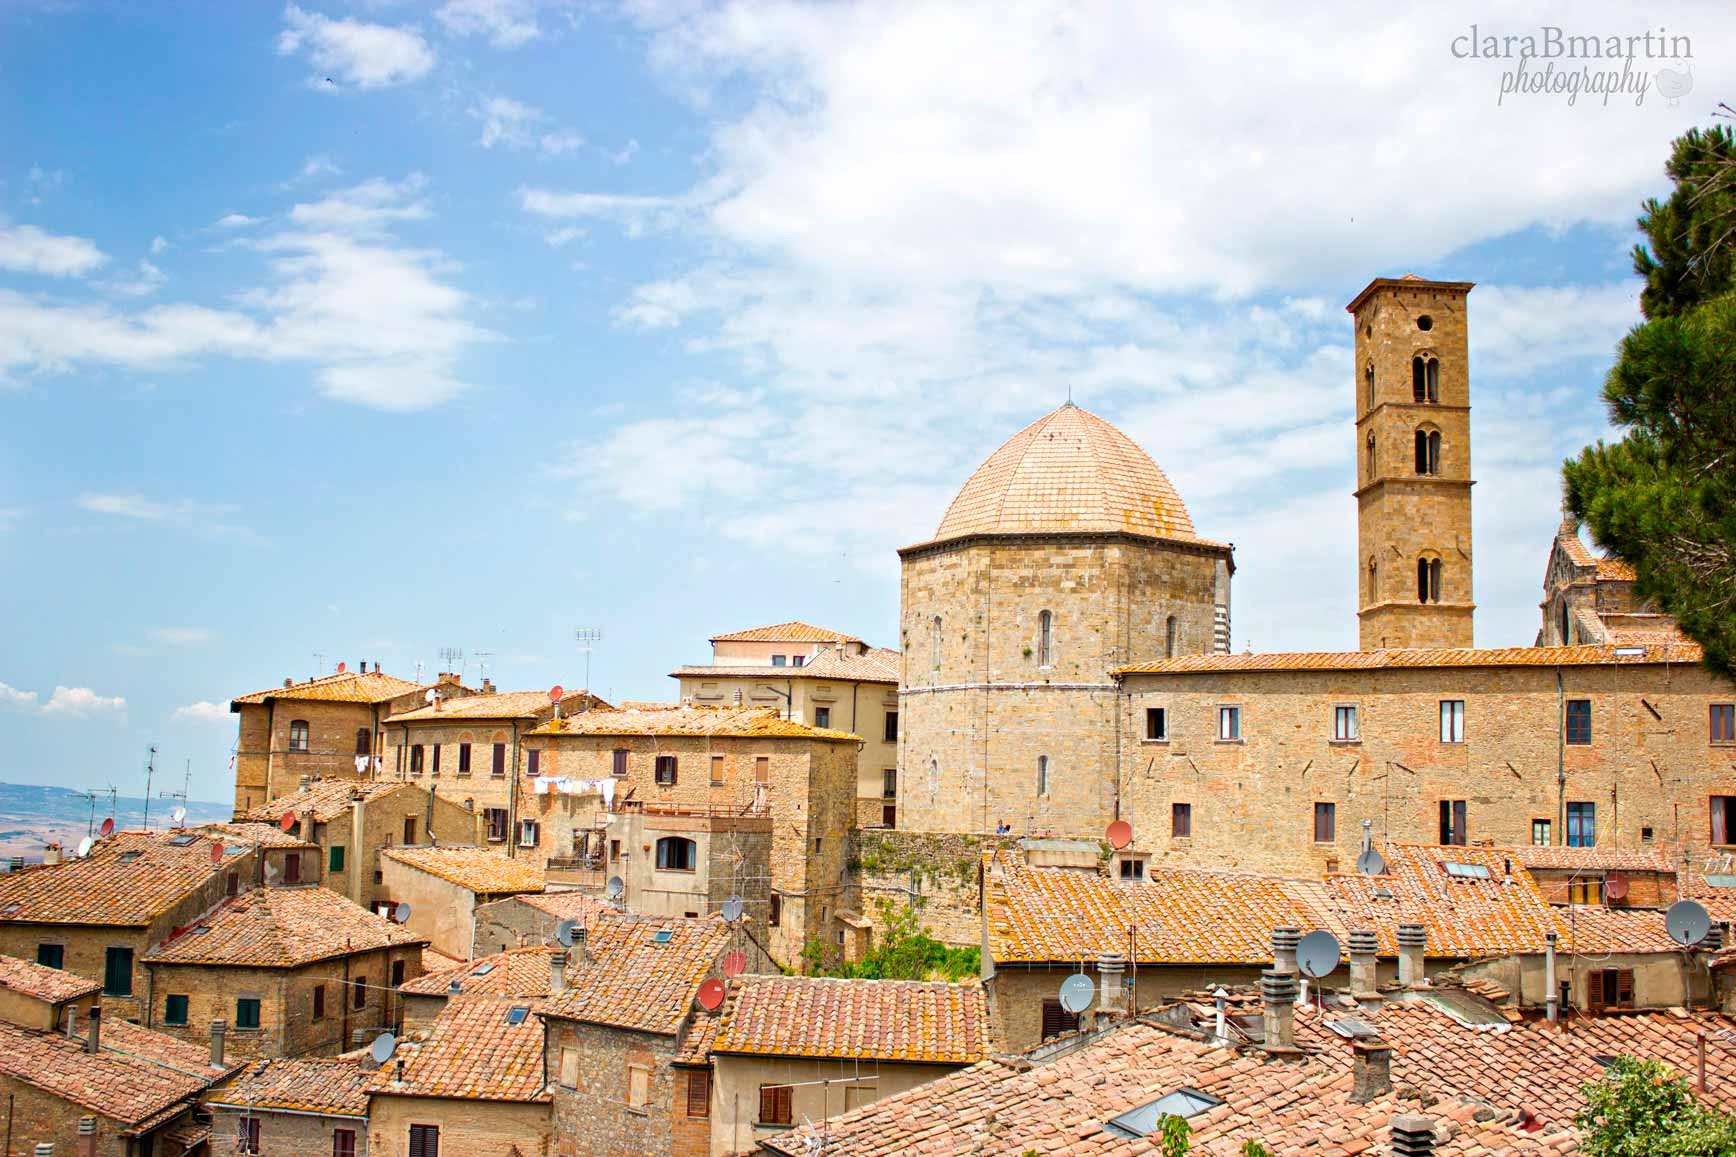 ToscanaclaraBmartin_10